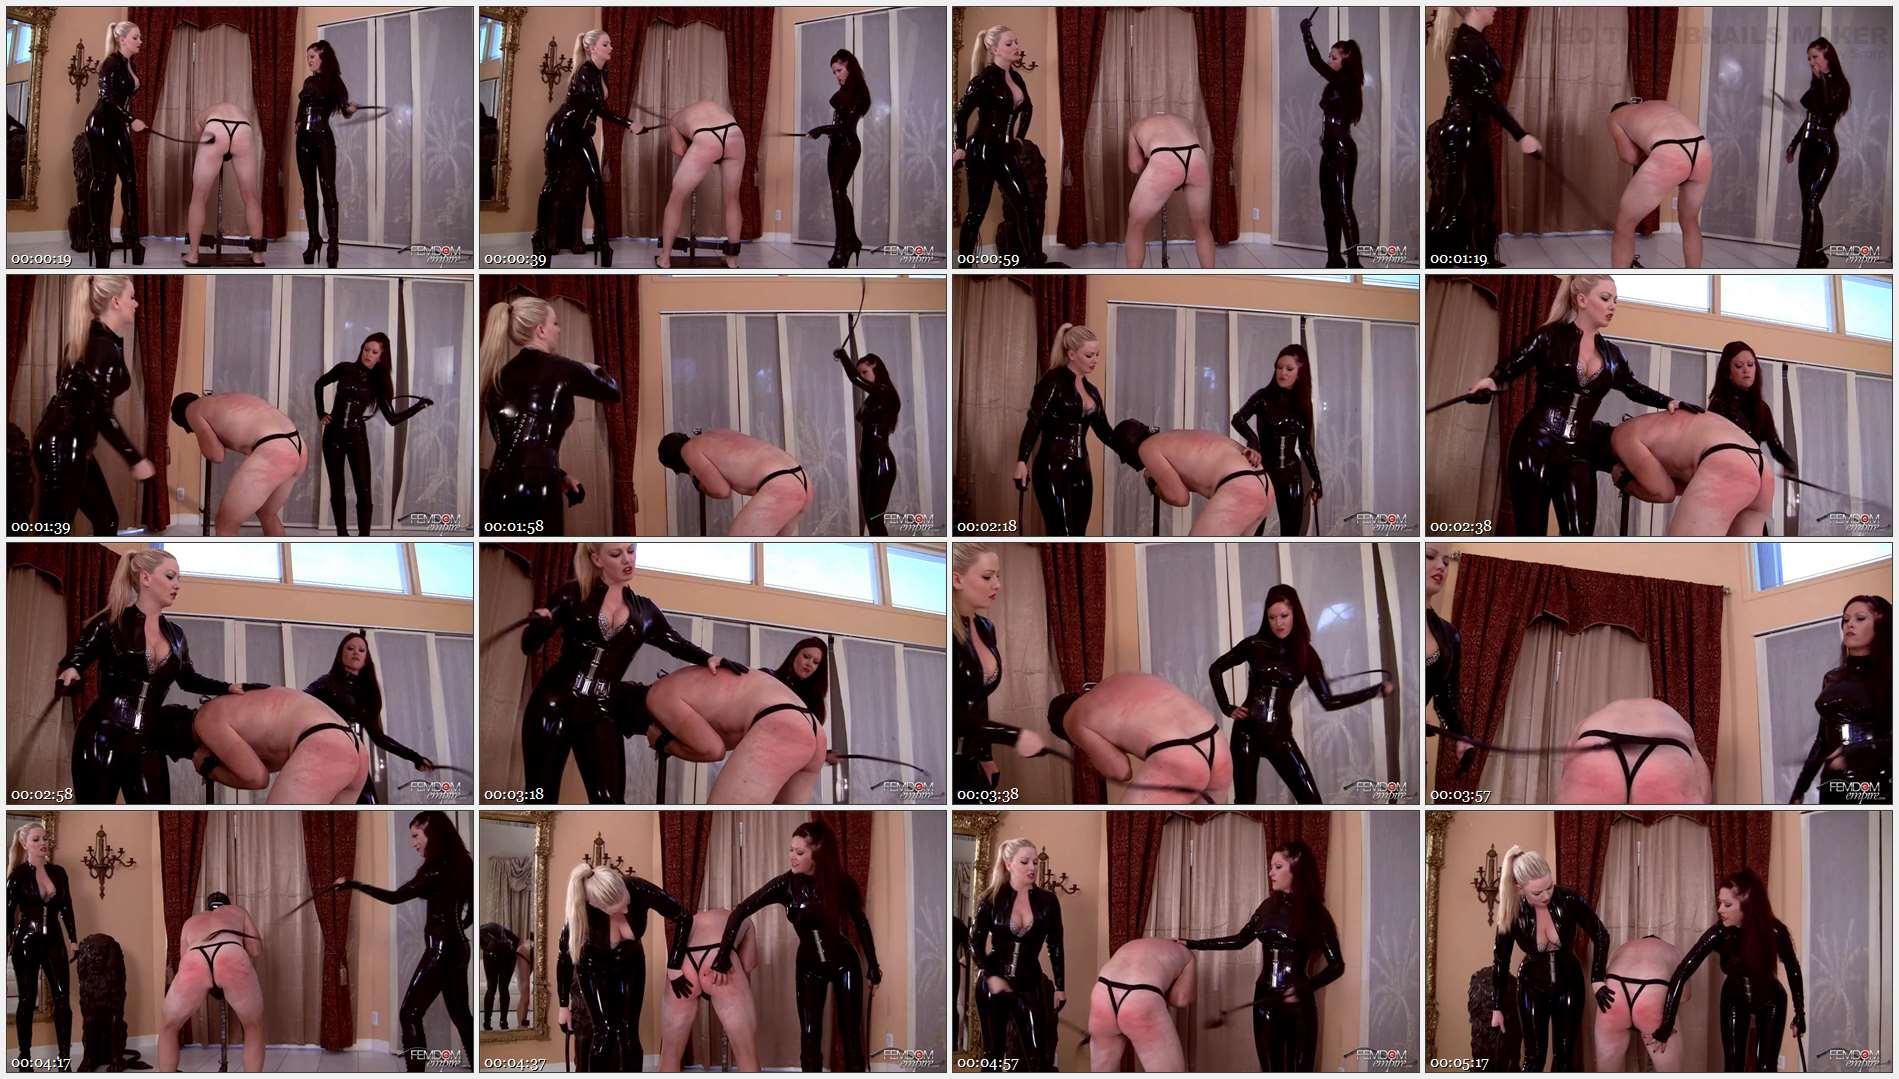 Deanna Storm – Lexi Sindel – Whipping Punishment